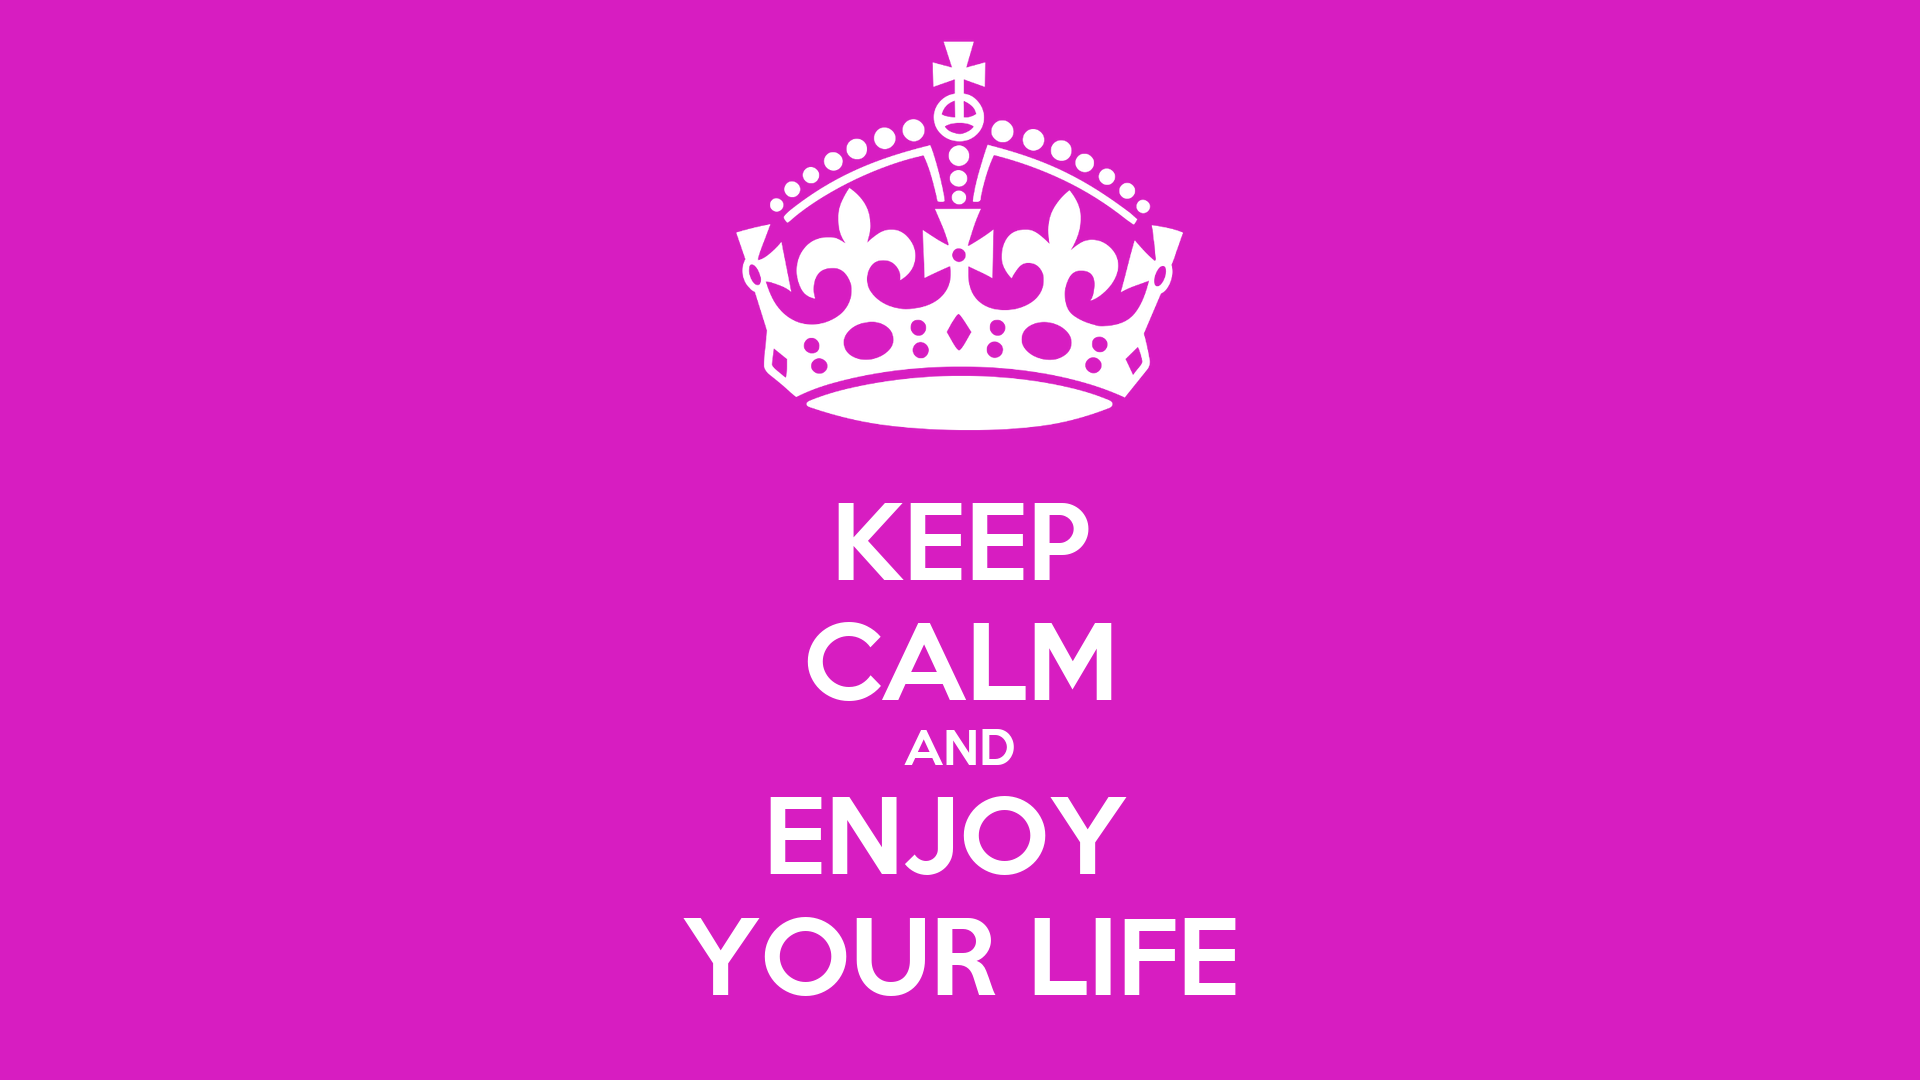 enjoy your life images - photo #8